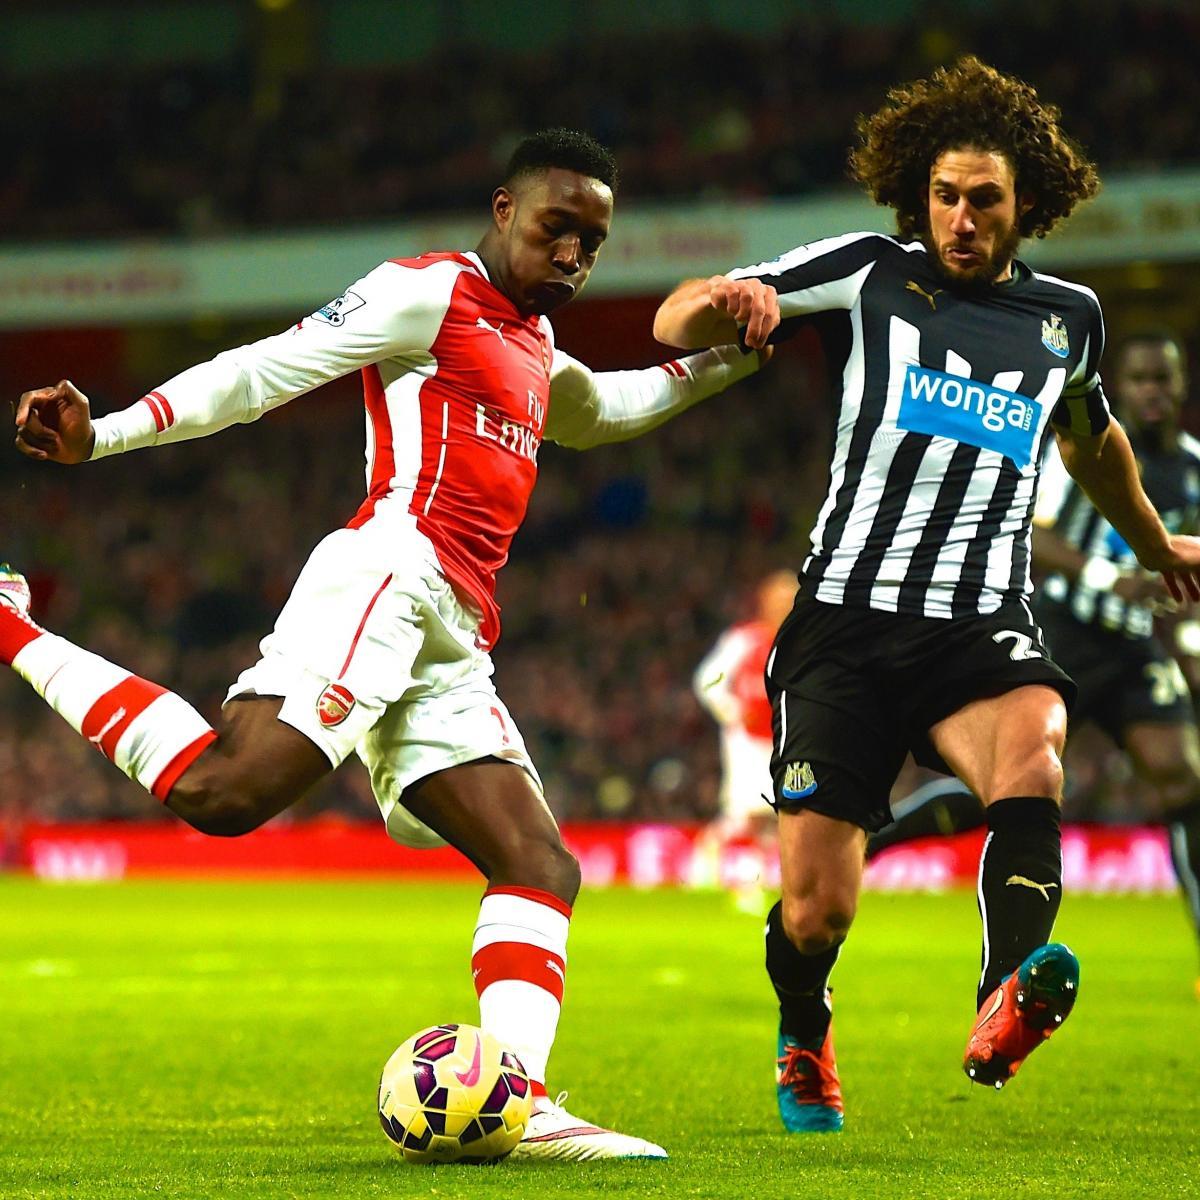 Arsenal Vs Tottenham Live Score Highlights From Premier: Arsenal Vs. Newcastle United: Live Score, Highlights From